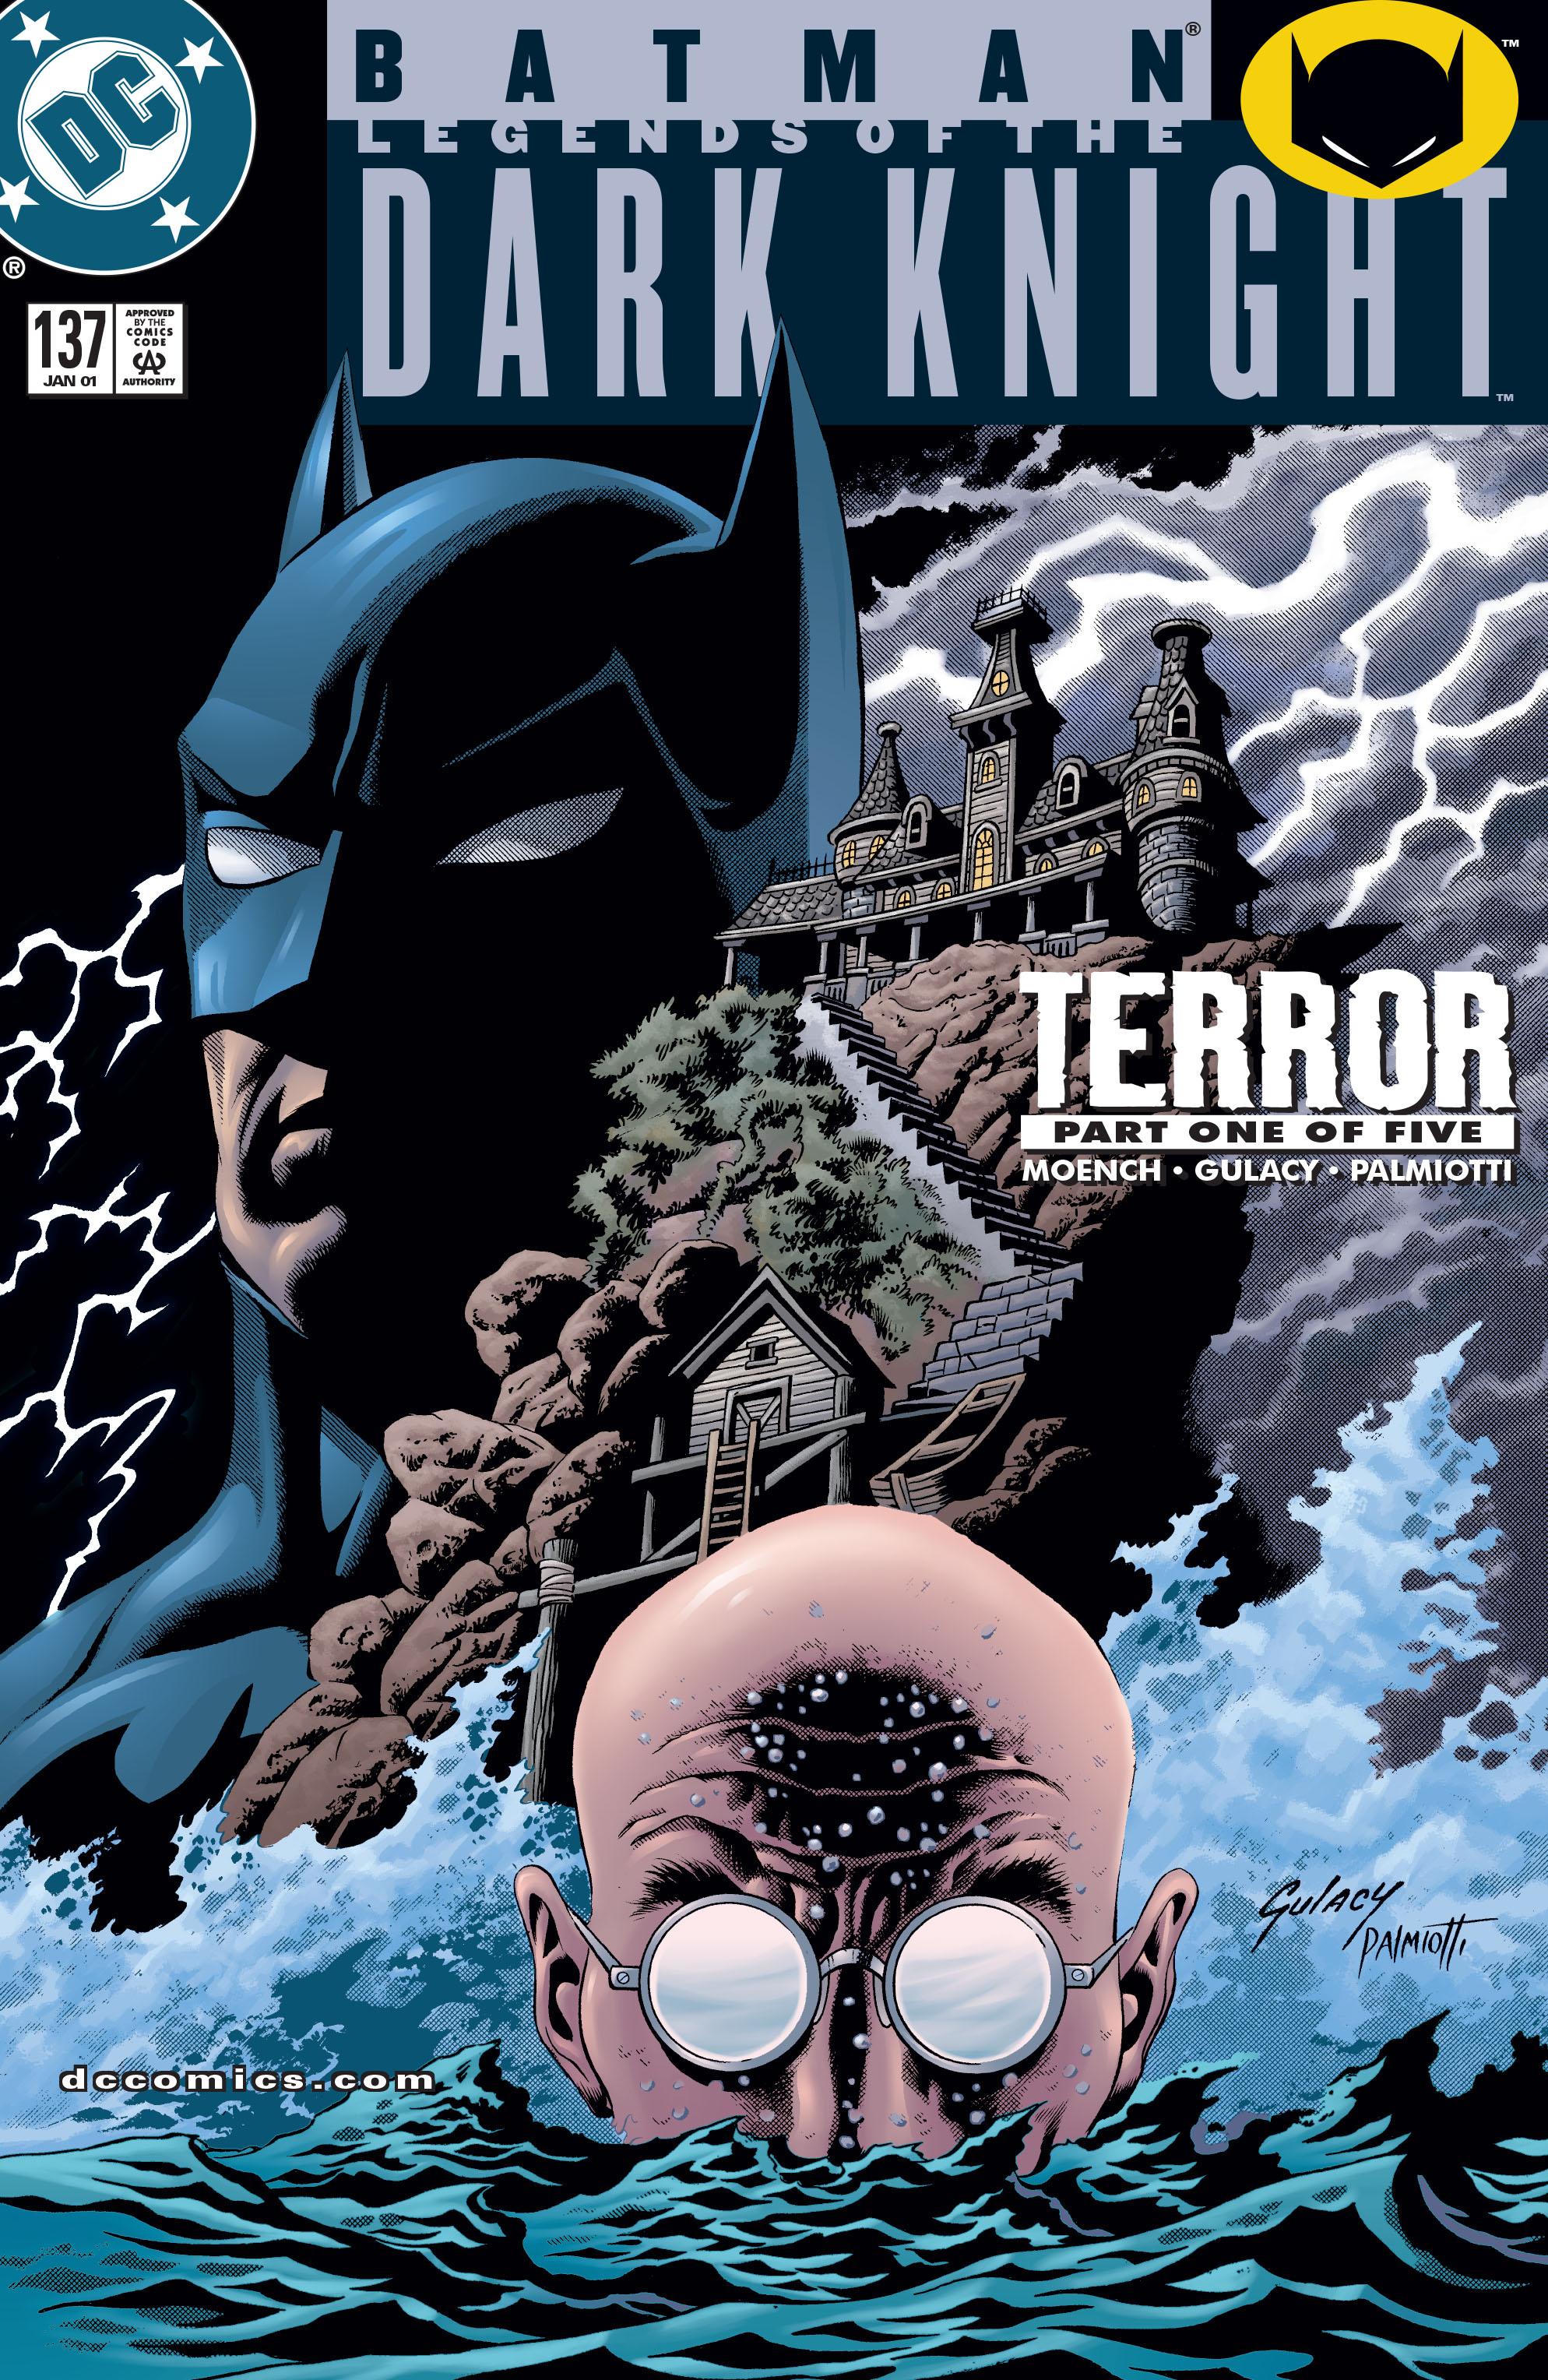 Batman: Legends of the Dark Knight 137 Page 1